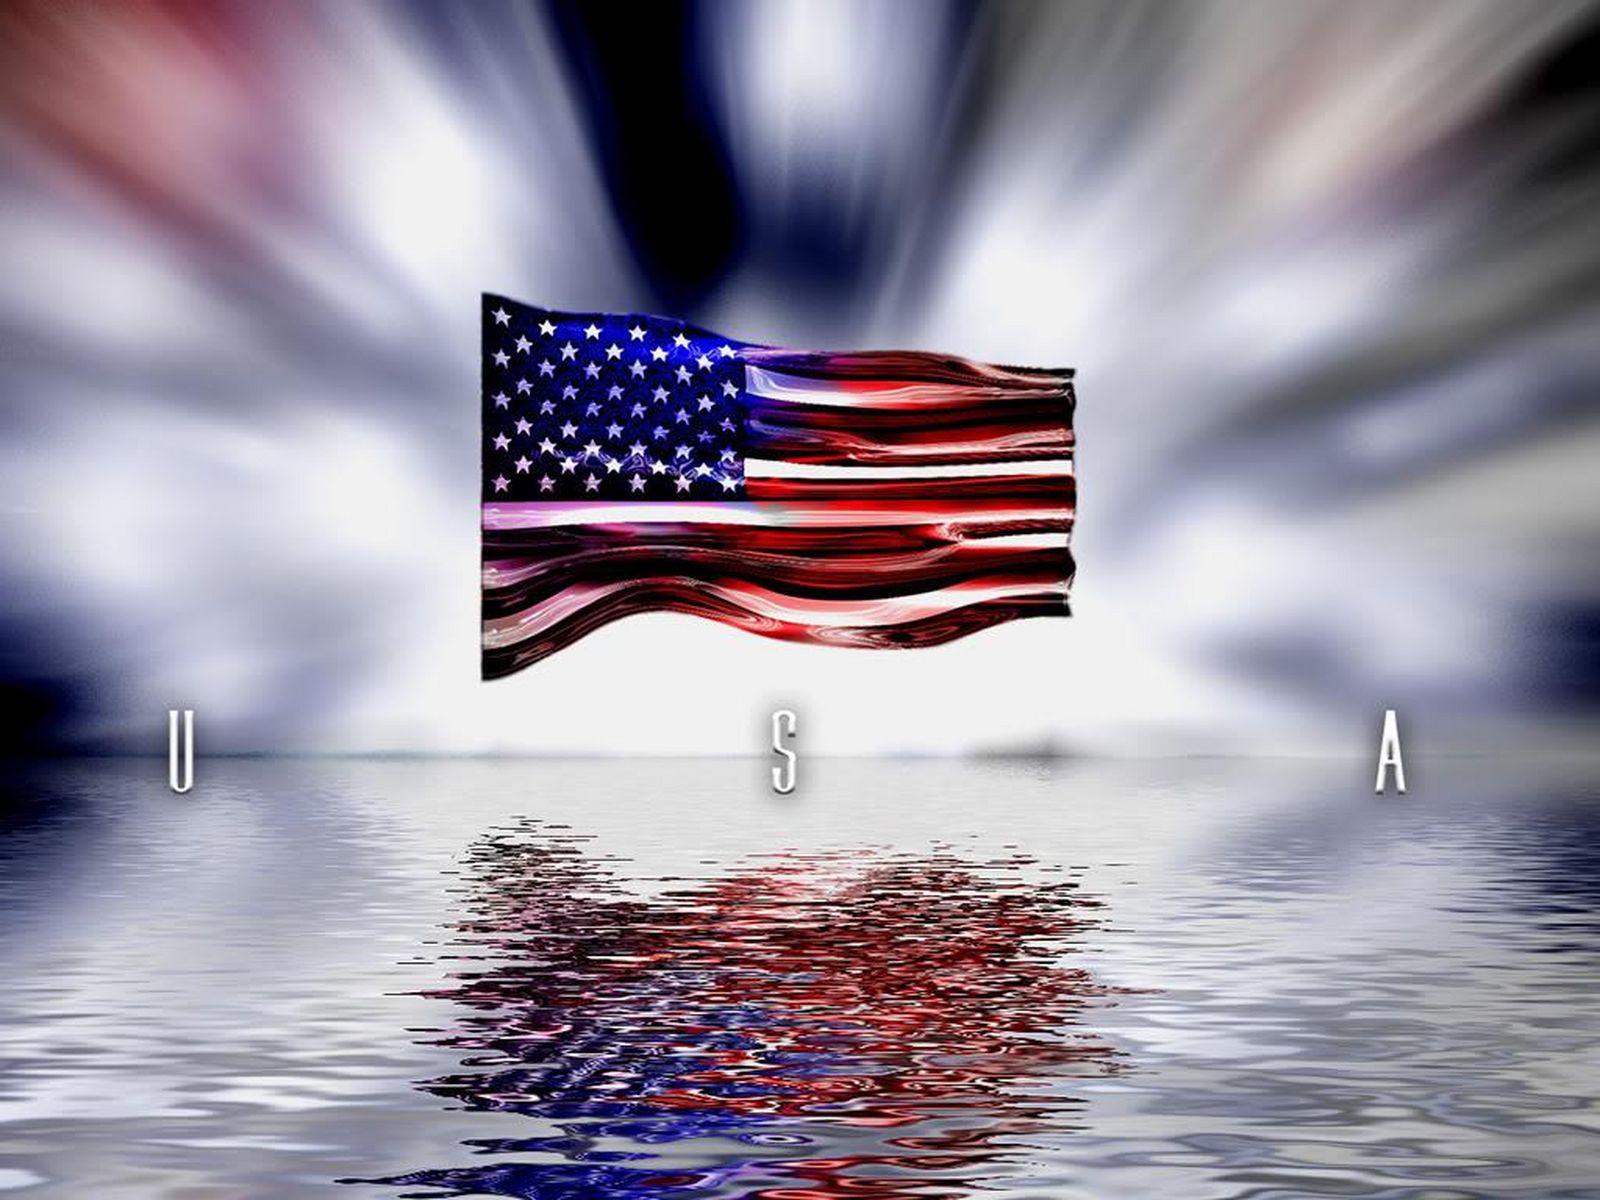 American Flag Desktop Wallpaper US Flag Photos Cool Wallpapers 1600x1200